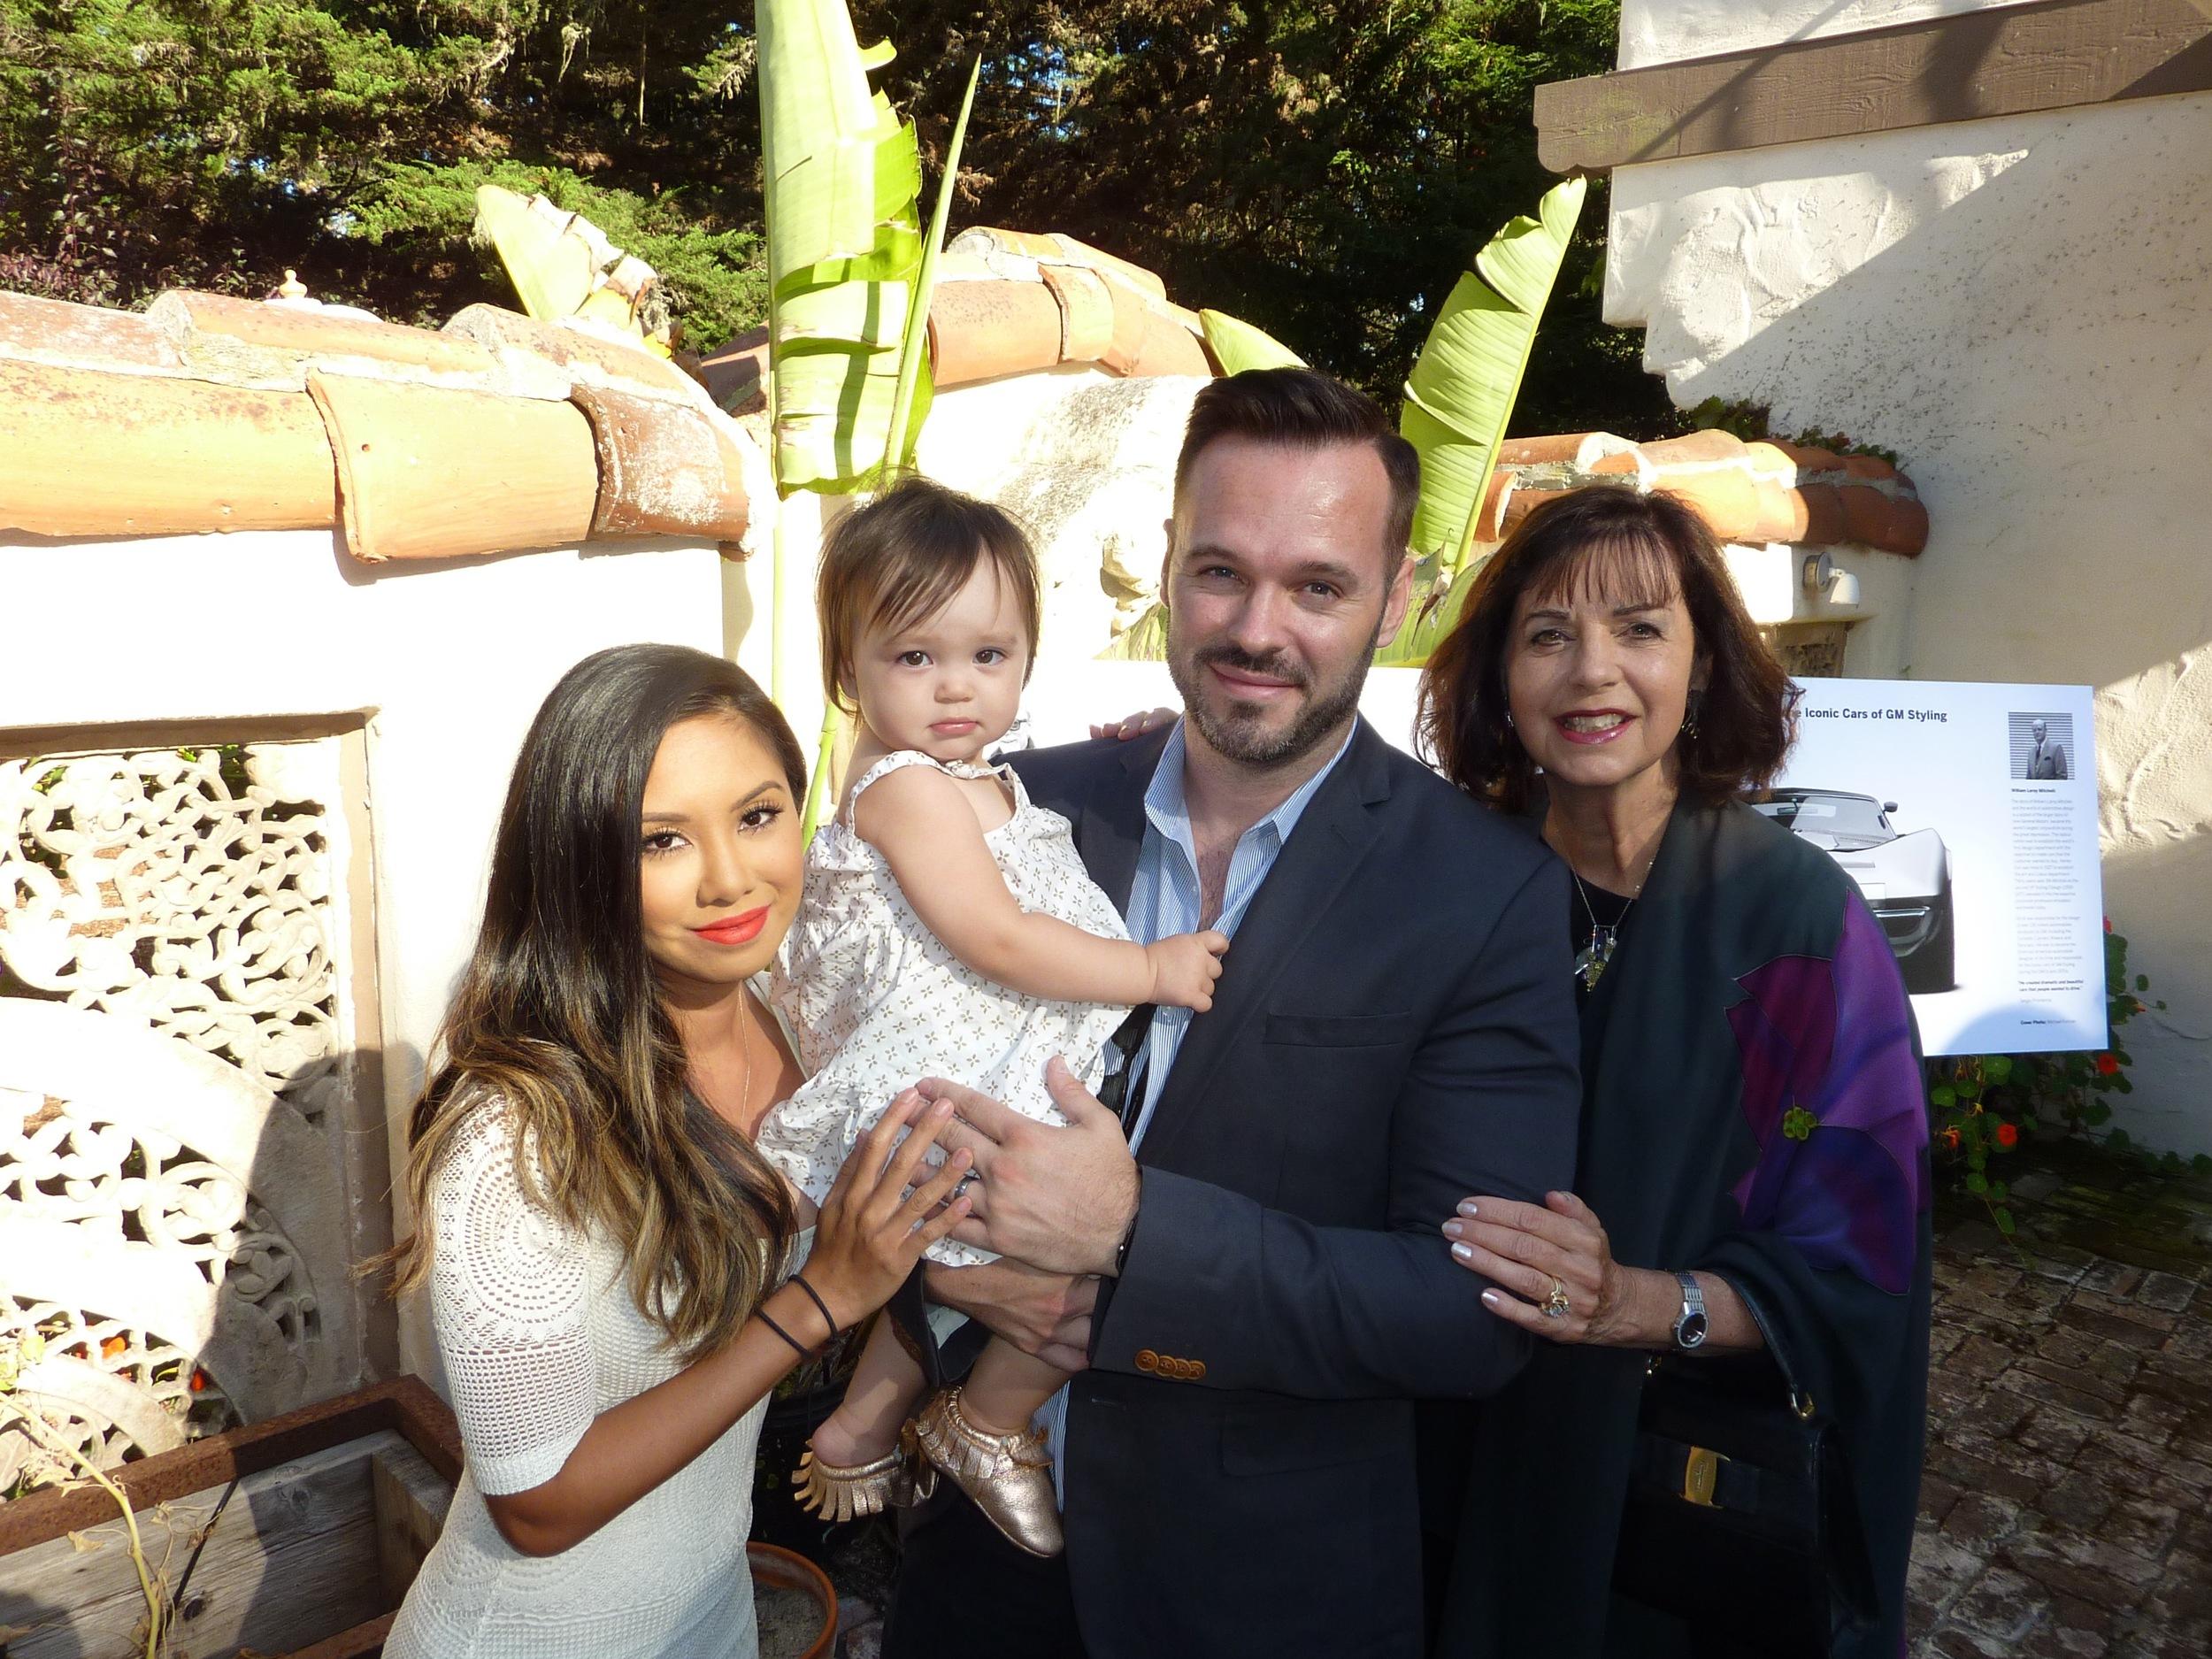 Rita-Coco-Chad-Carol-Lonberger Family